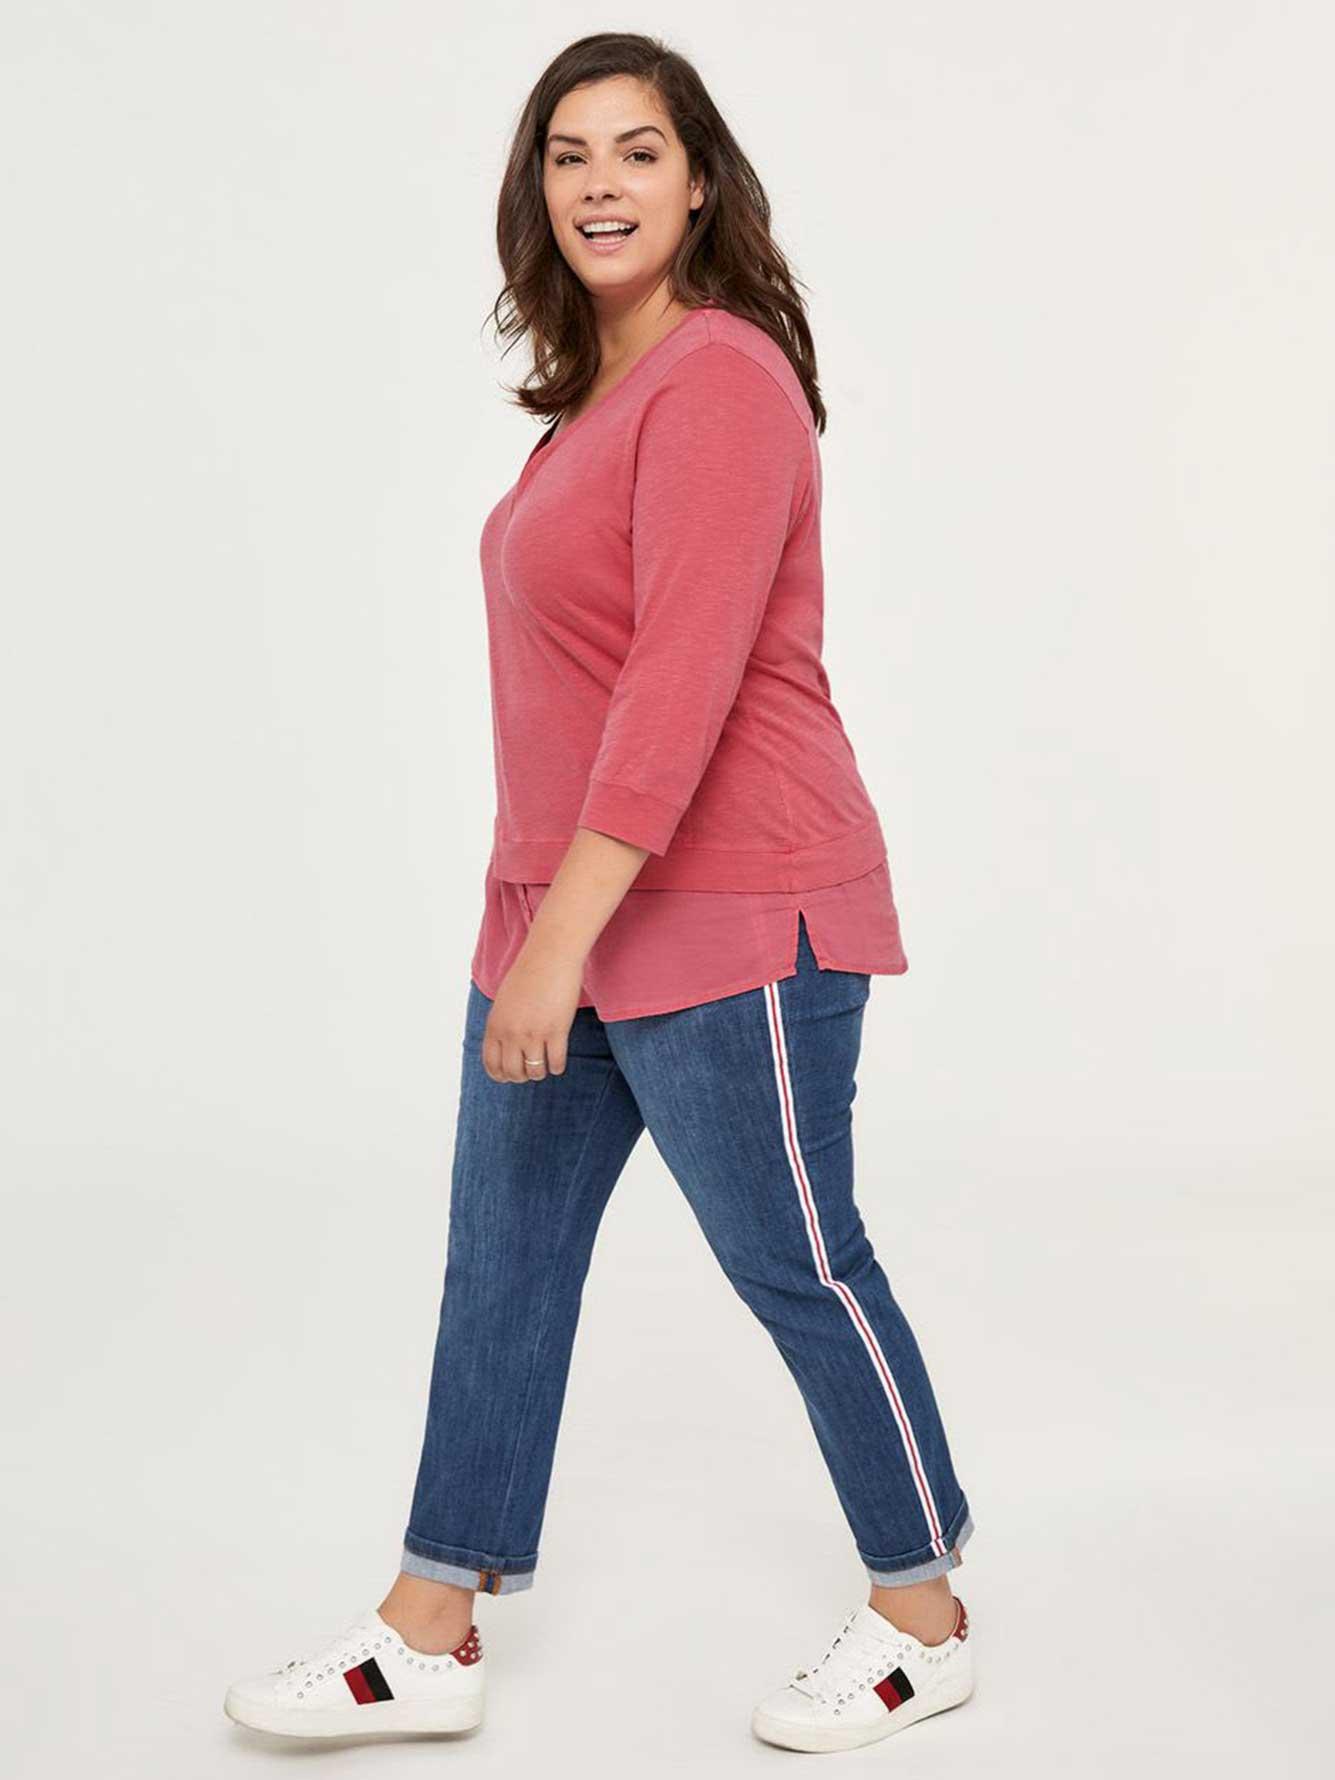 3 4 Printed Cotton Top With Split Neck D C Jeans Penningtons I Am Sleeveless Romper Blue Sea